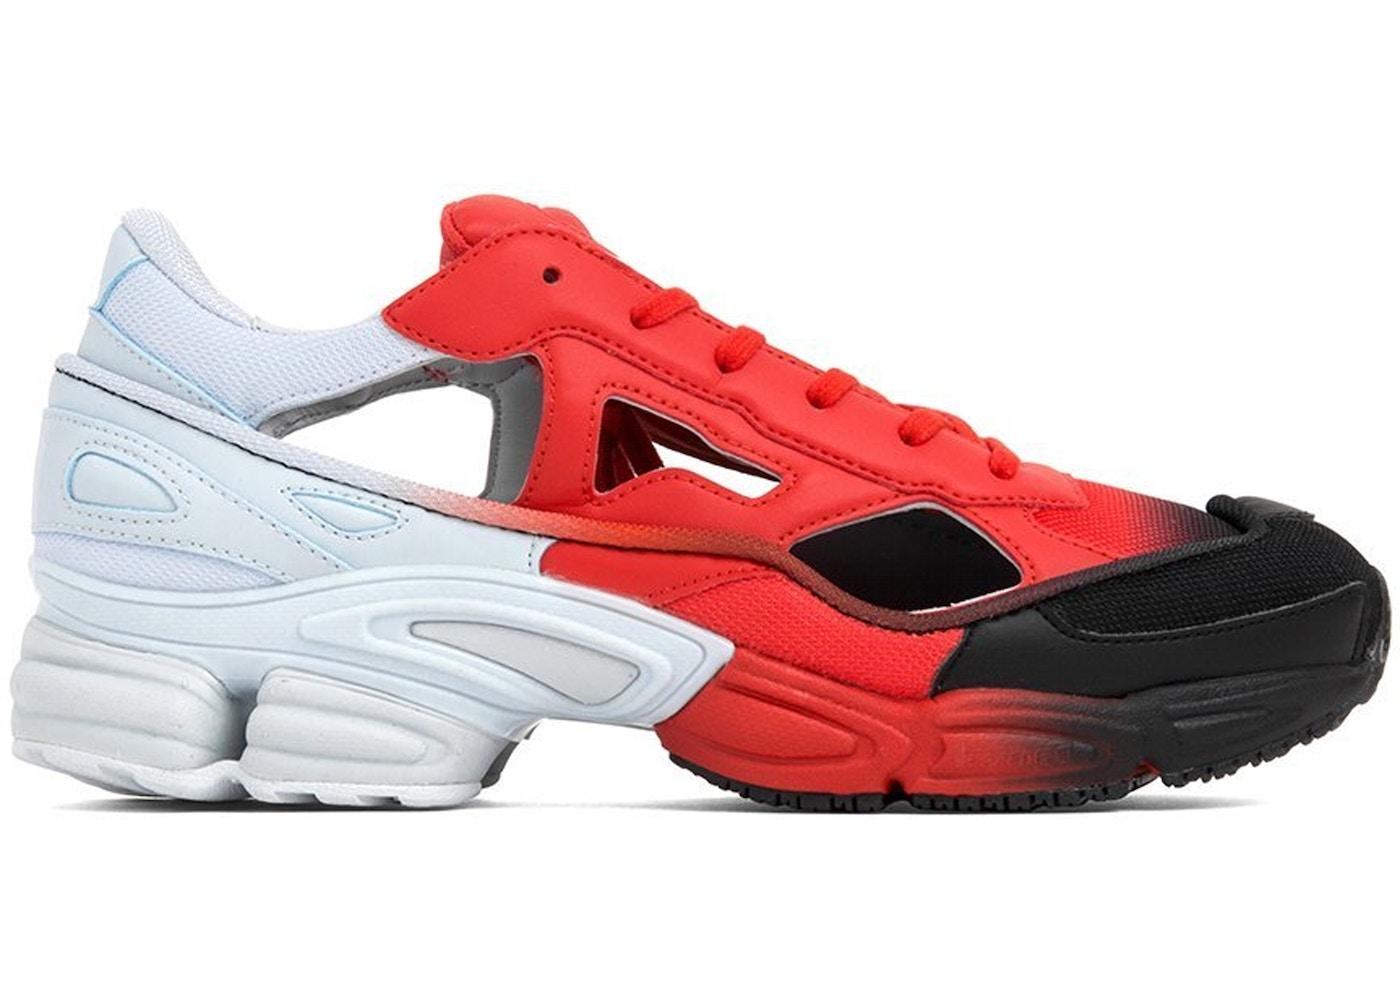 adidas Replicant Ozweego Raf Simons Halo Blue Red